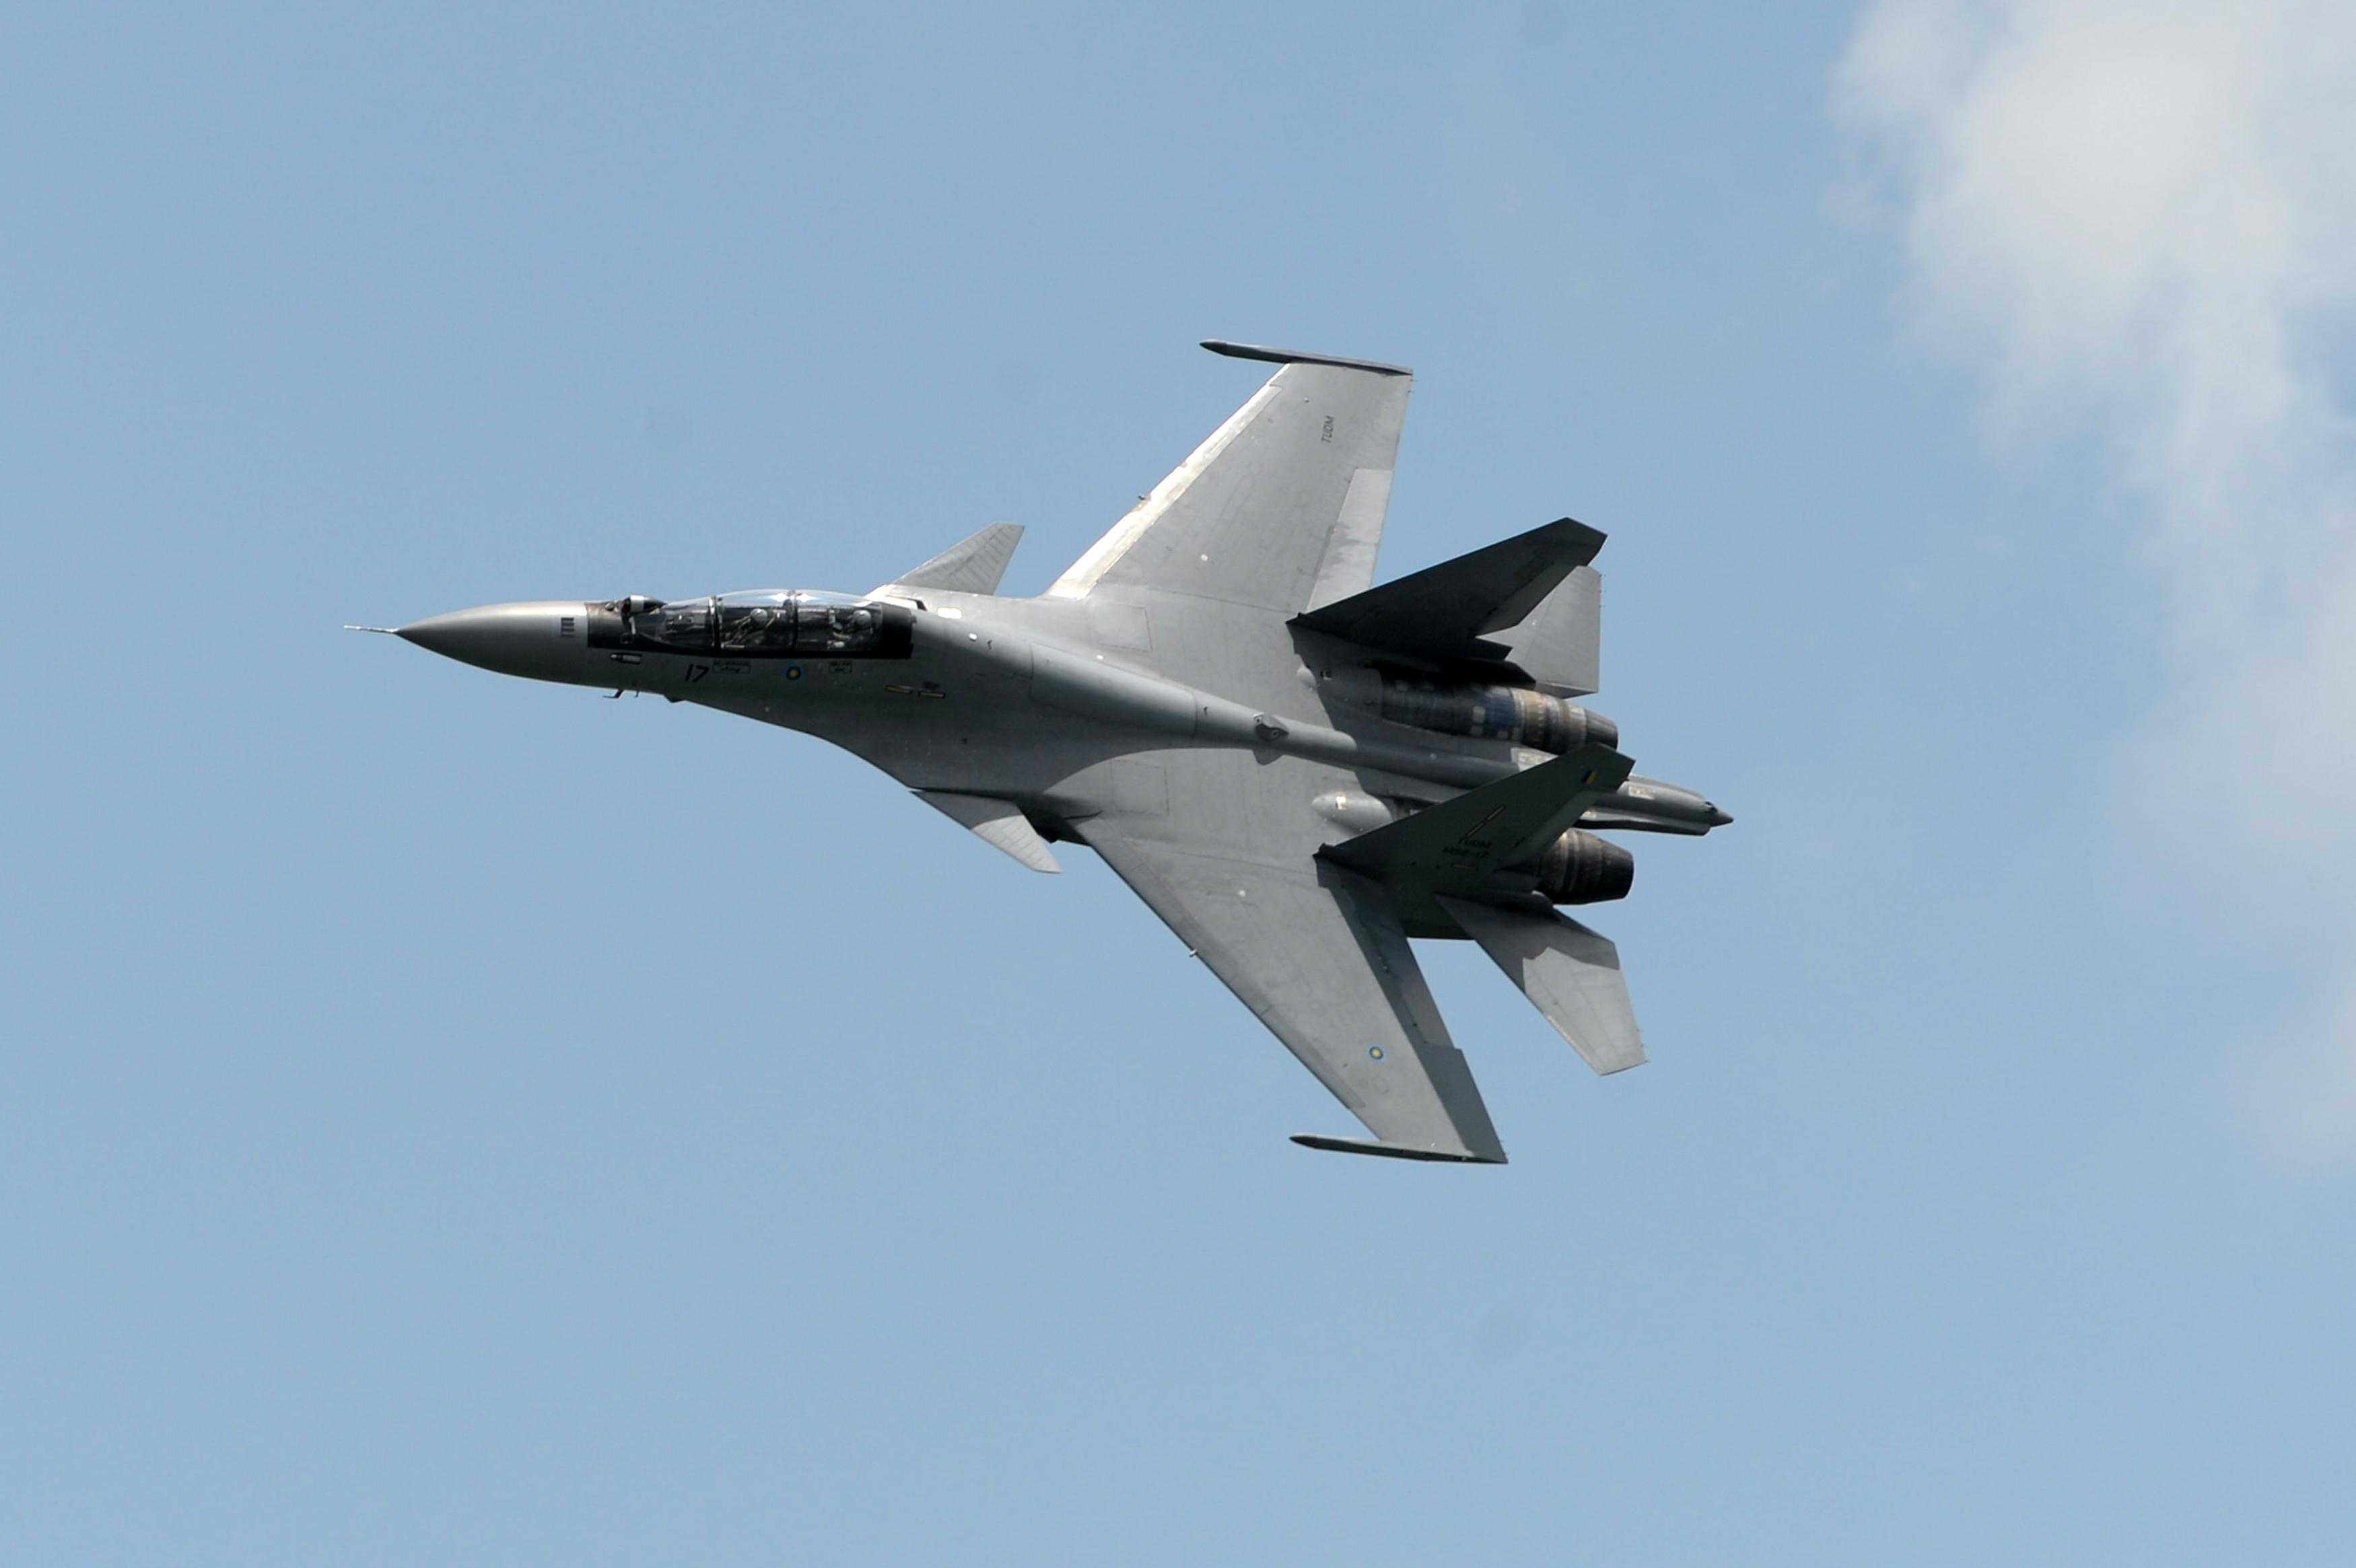 Maneuver By Russian Fighter Near U.S. Navy Jet Deemed